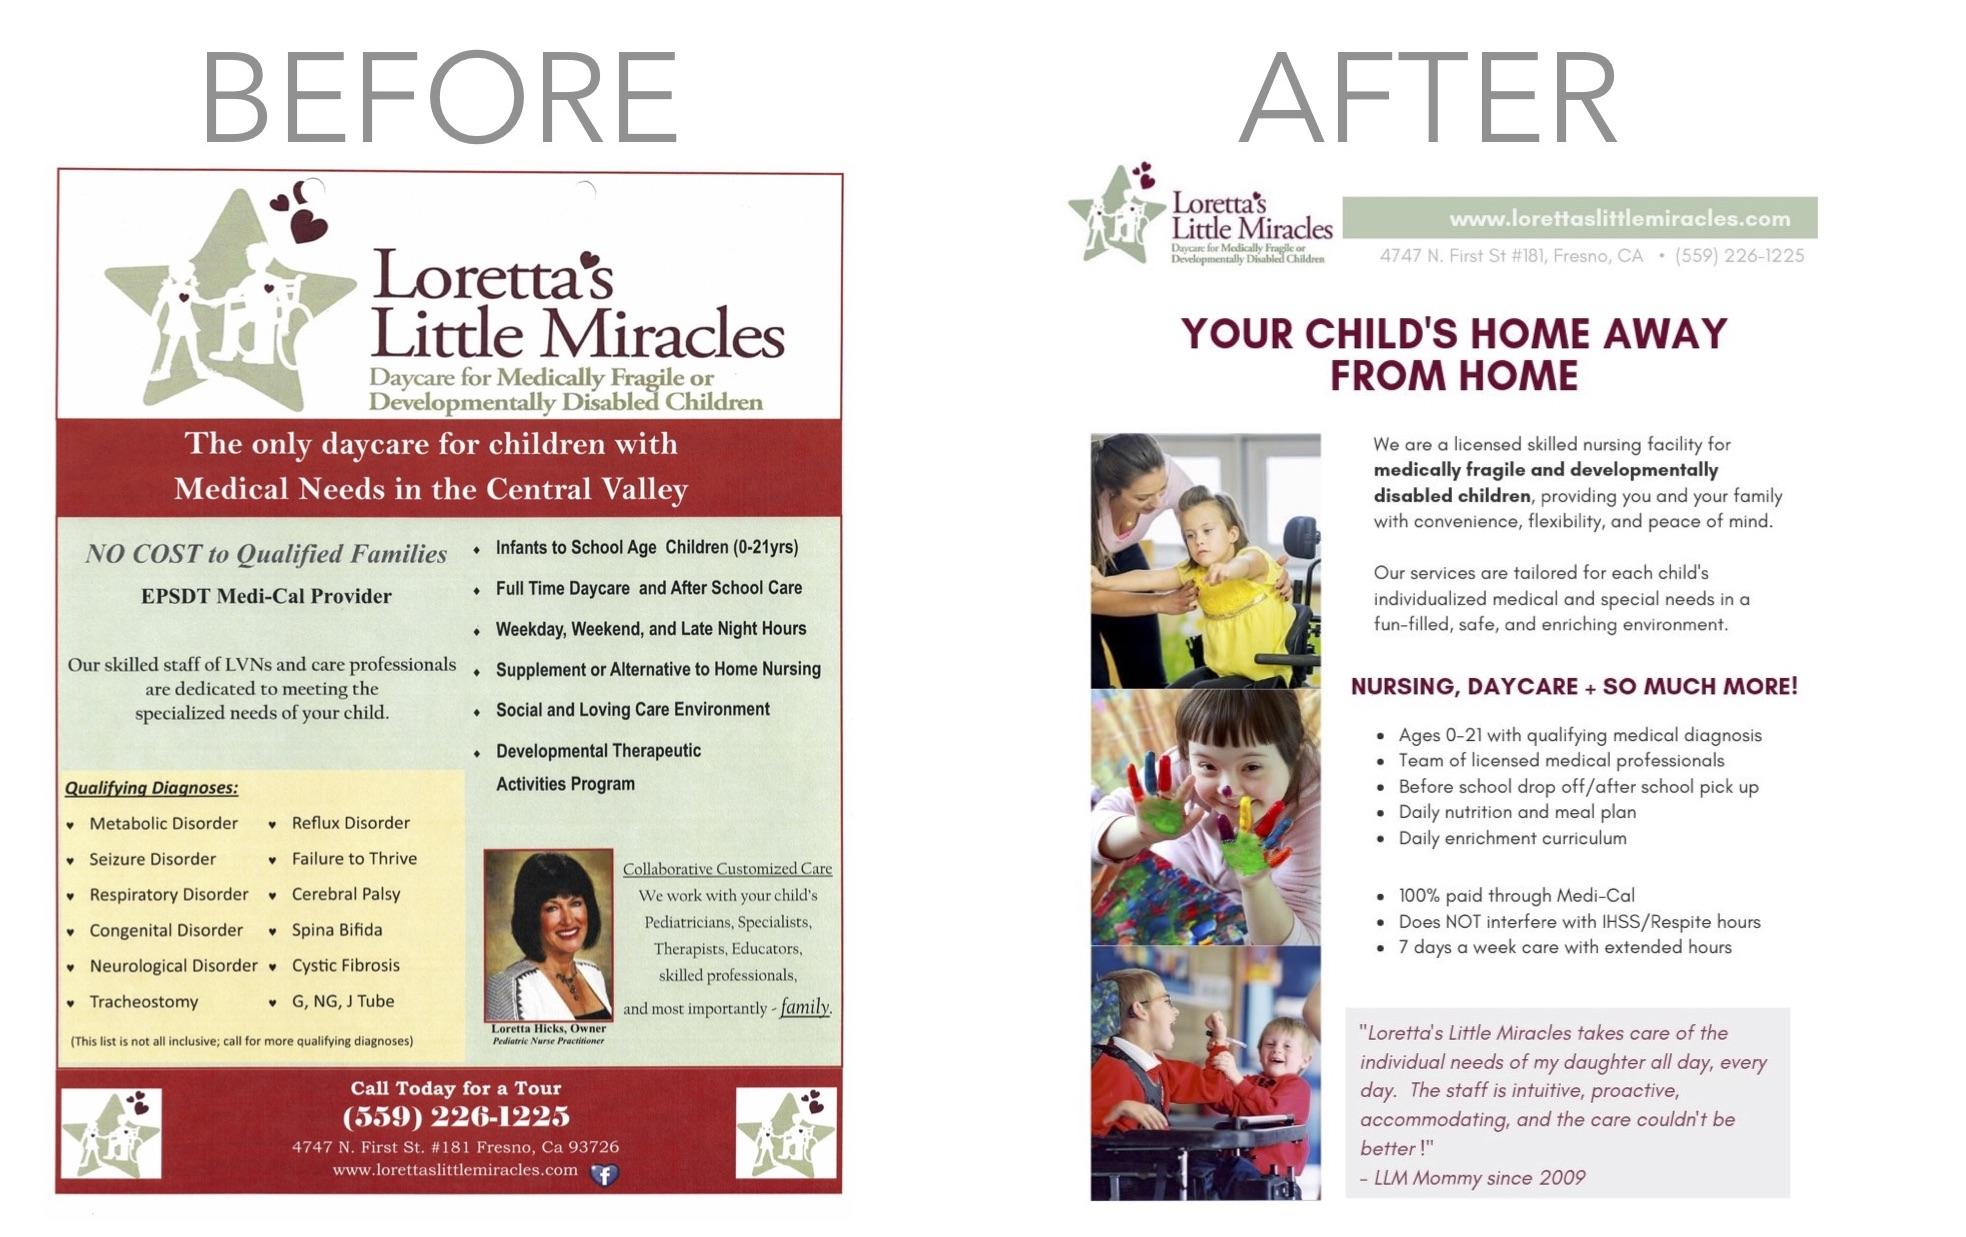 Erin Brennan - Marketing Case Study - Loretta's Little Miracles.jpg